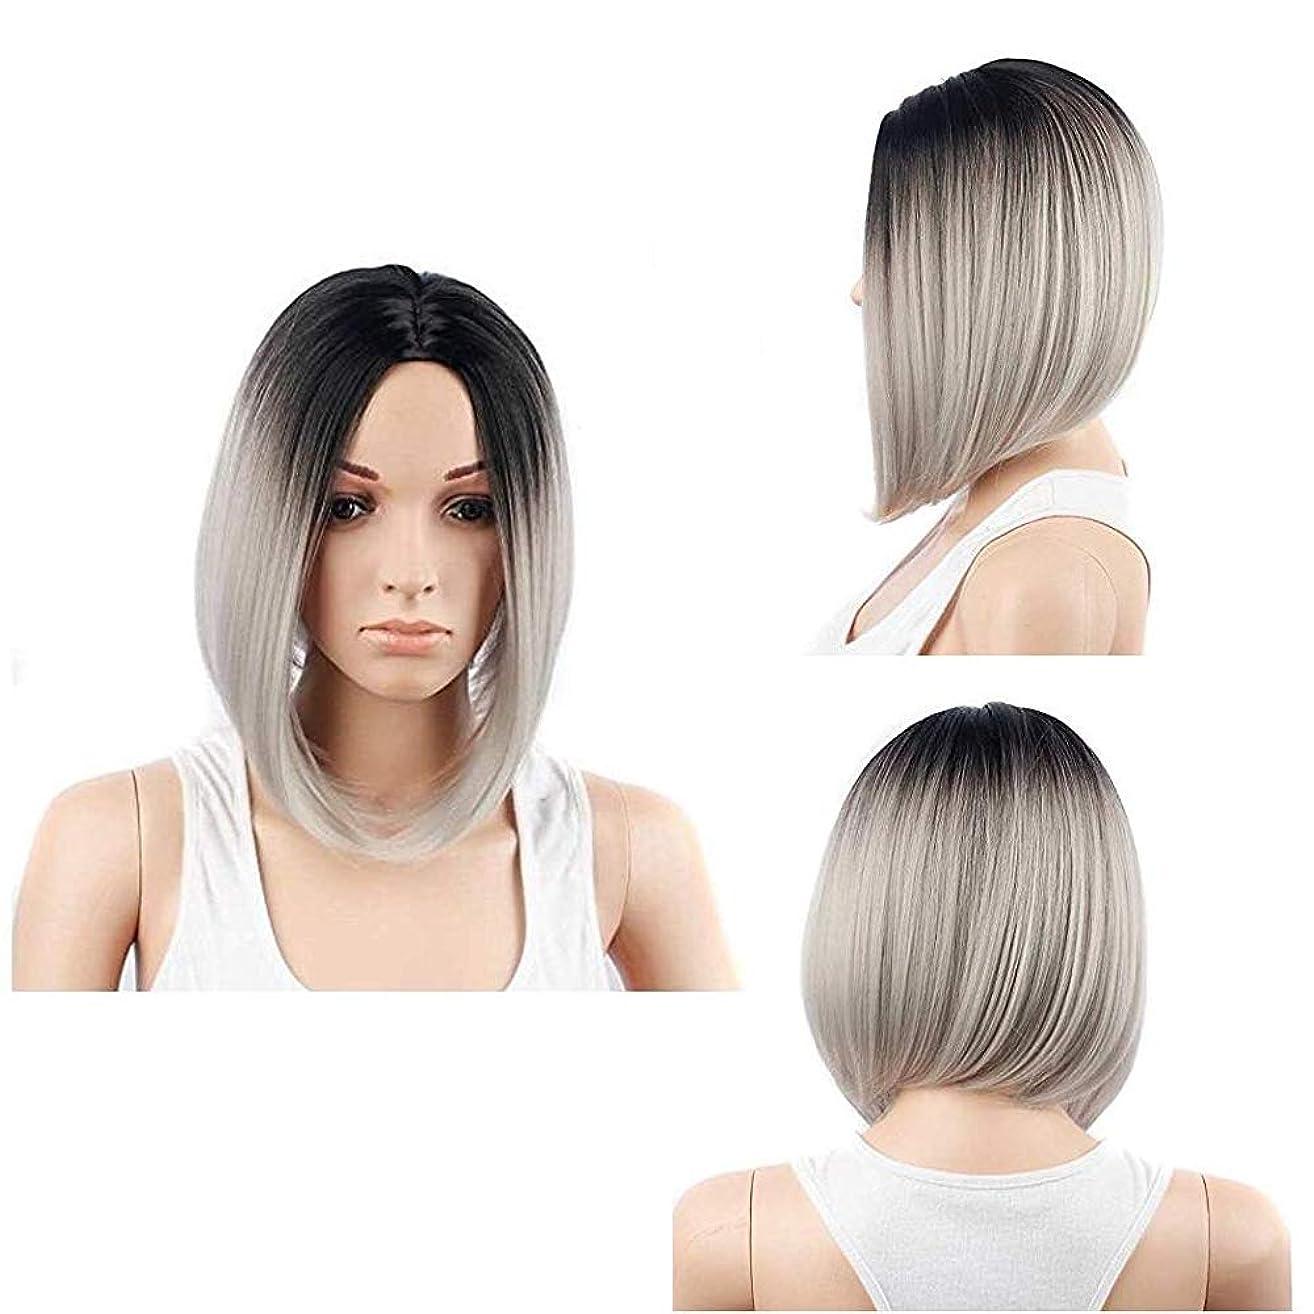 URPRIME Short Bob Hair Wigs 12